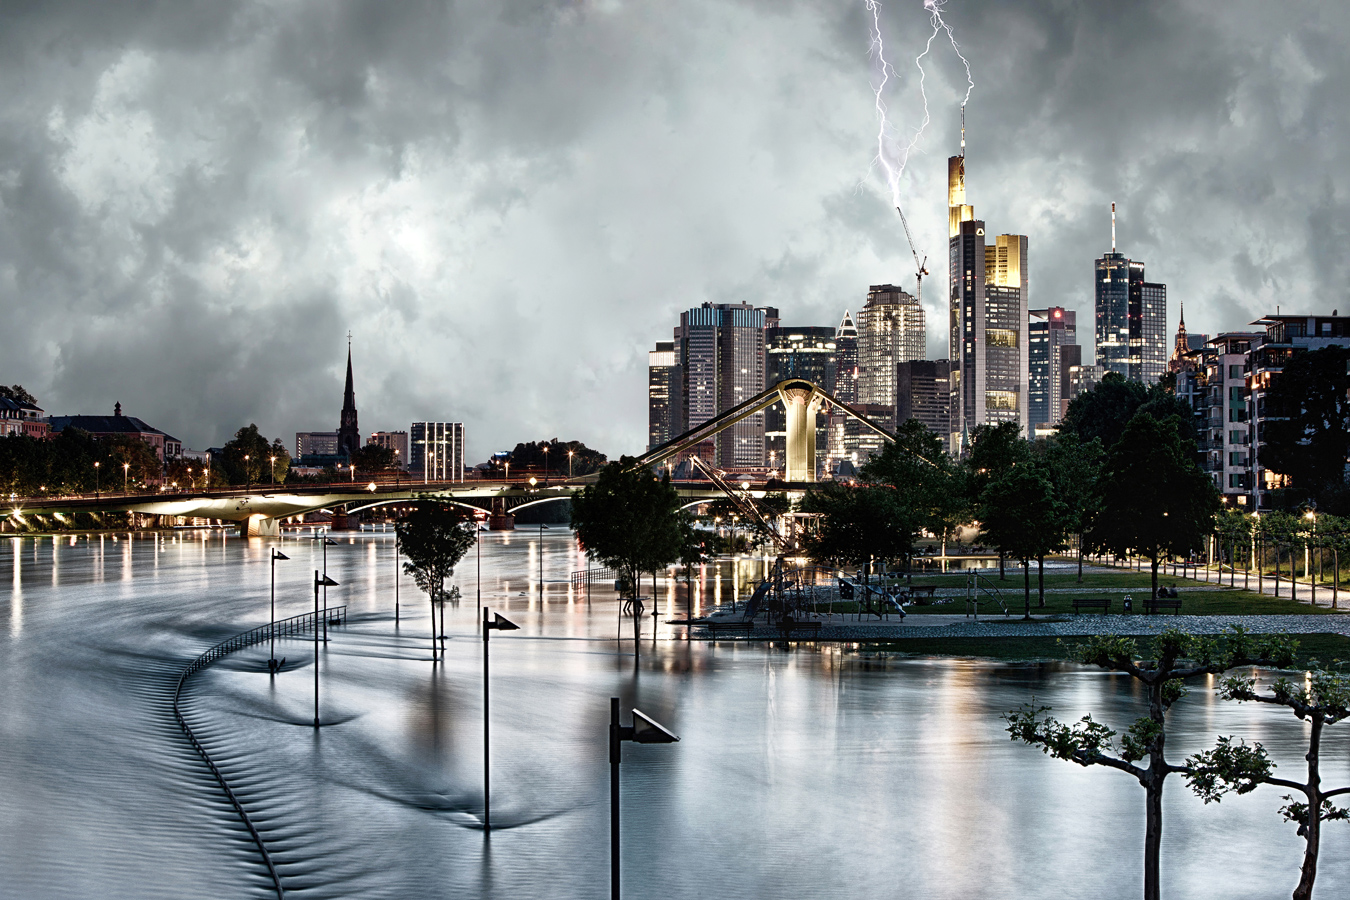 Storm over Frankfurt (2013)